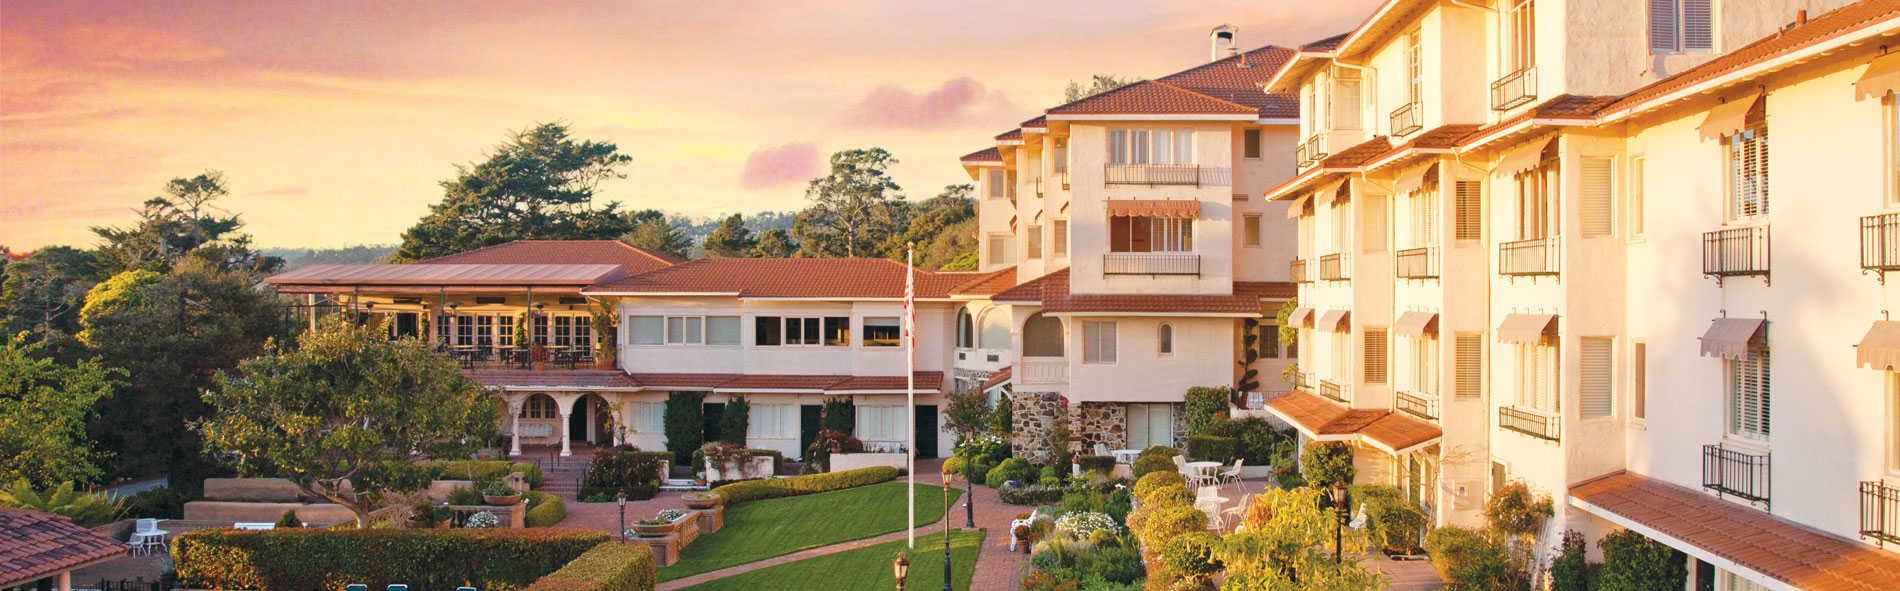 Best Kitchen Gallery: Resort Property Management Classic Hotels Resorts Luxury Hotel of Hotel And Resort Management  on rachelxblog.com